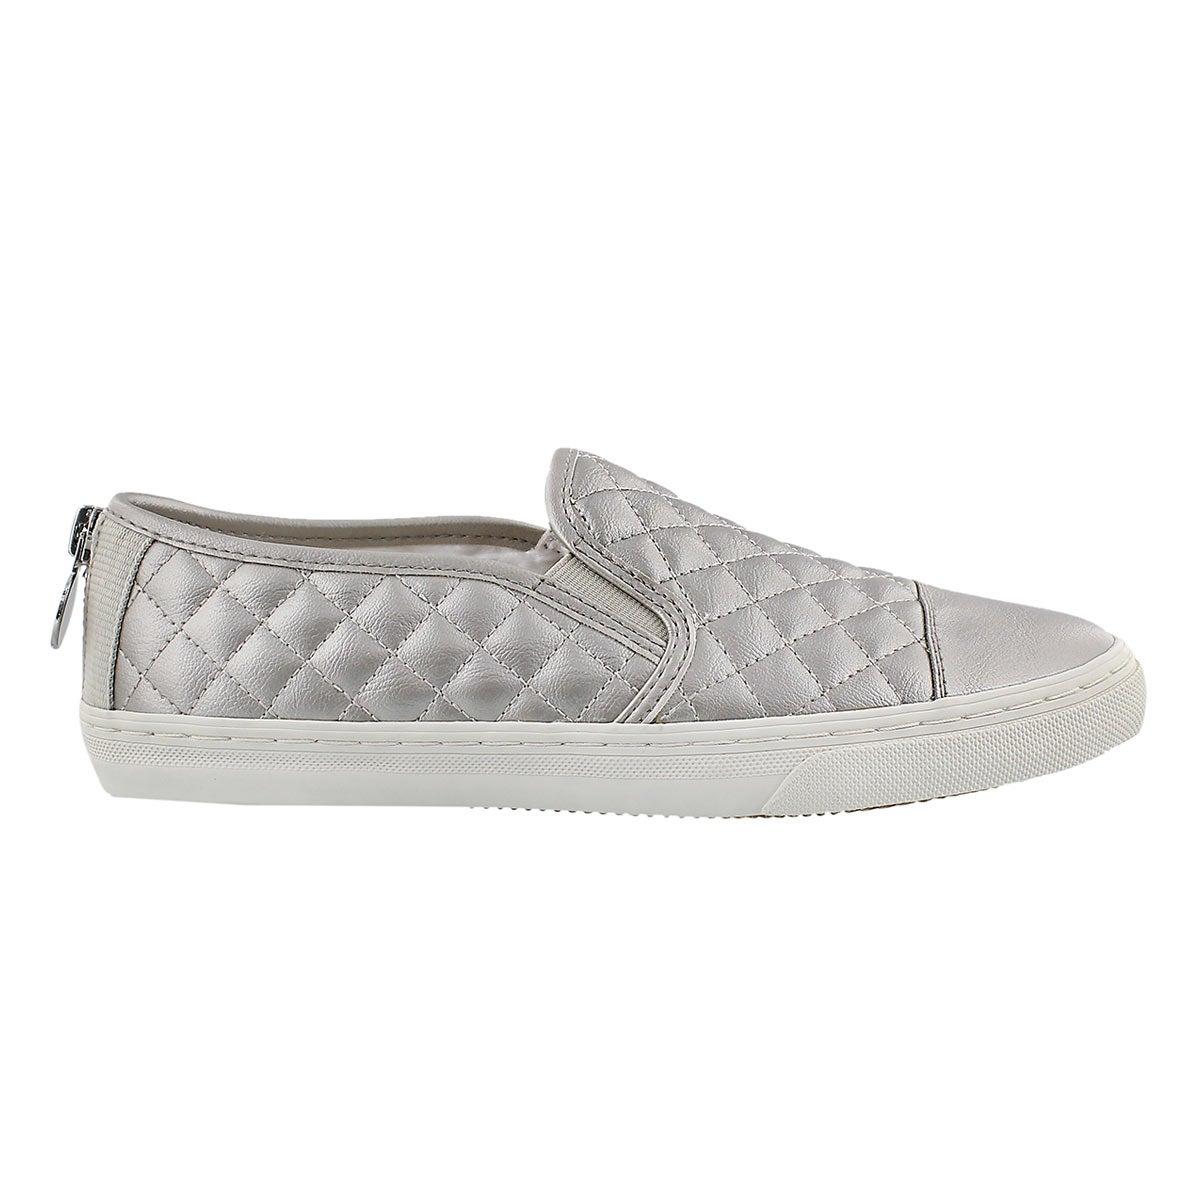 Lds New Club wht/silver slip on sneaker